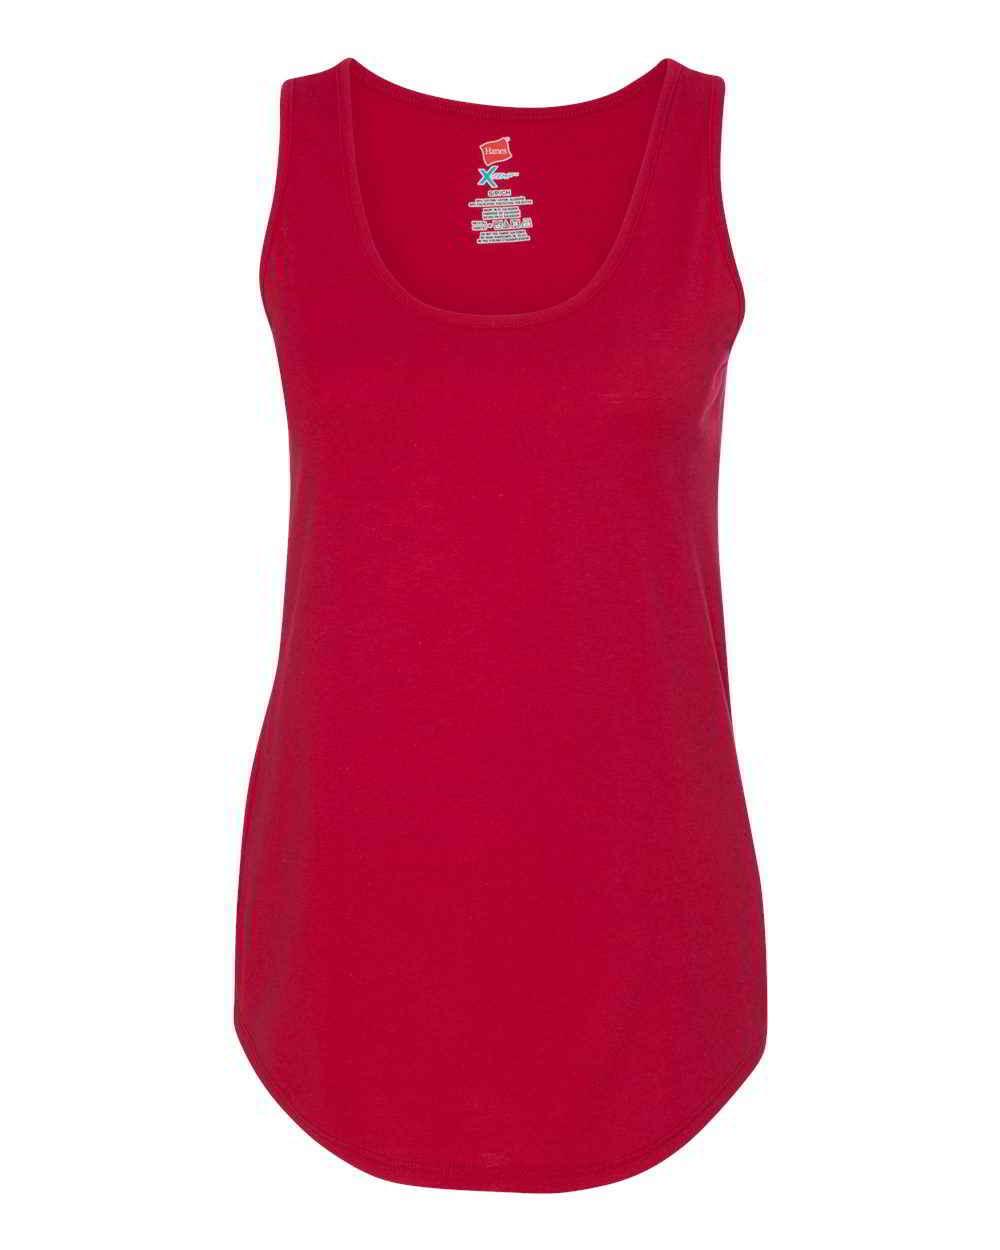 Hanes-Ladies-Moisture-Wicking-Shirts-Sleeveless-X-Temp-Women-039-s-Tank-Top thumbnail 6